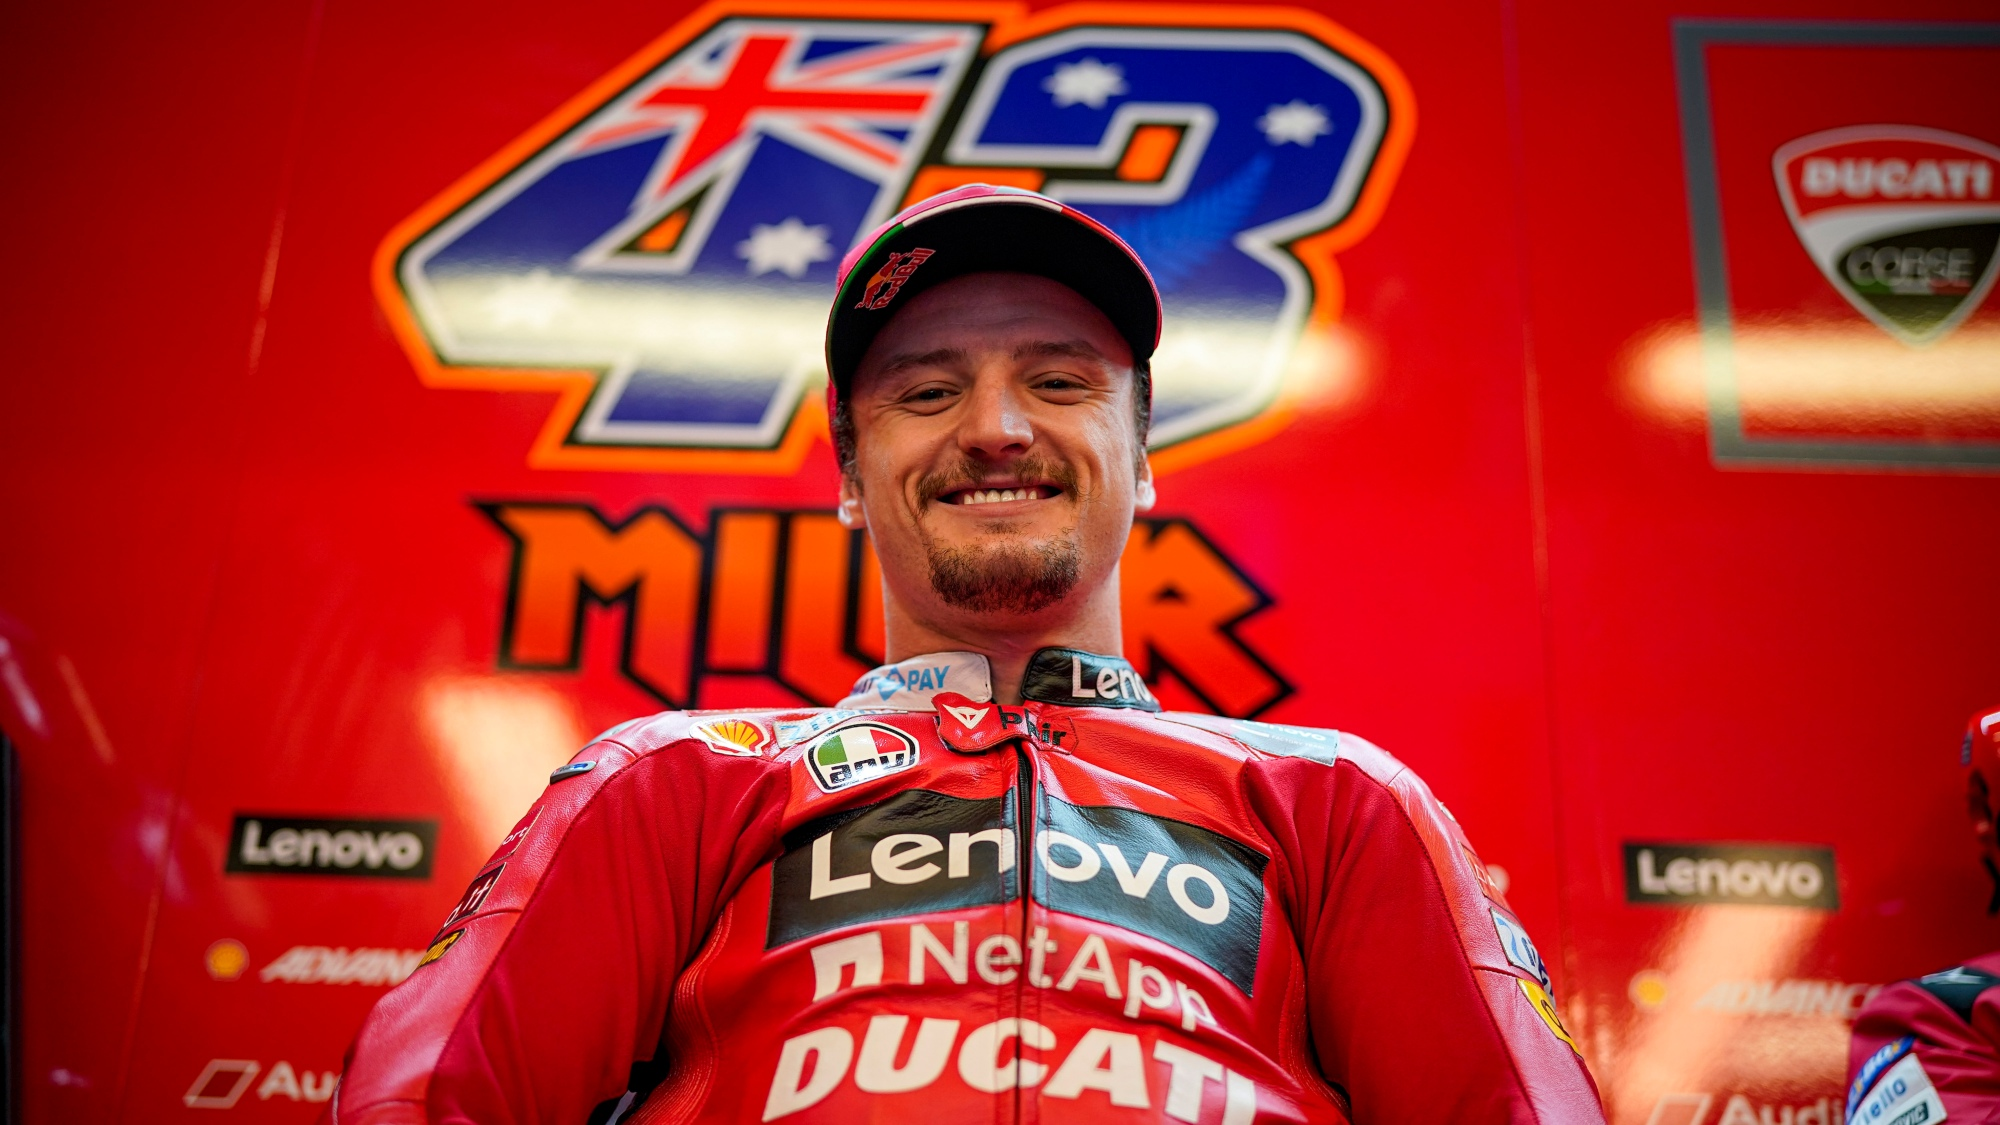 Jack Miller, 2021 MotoGP